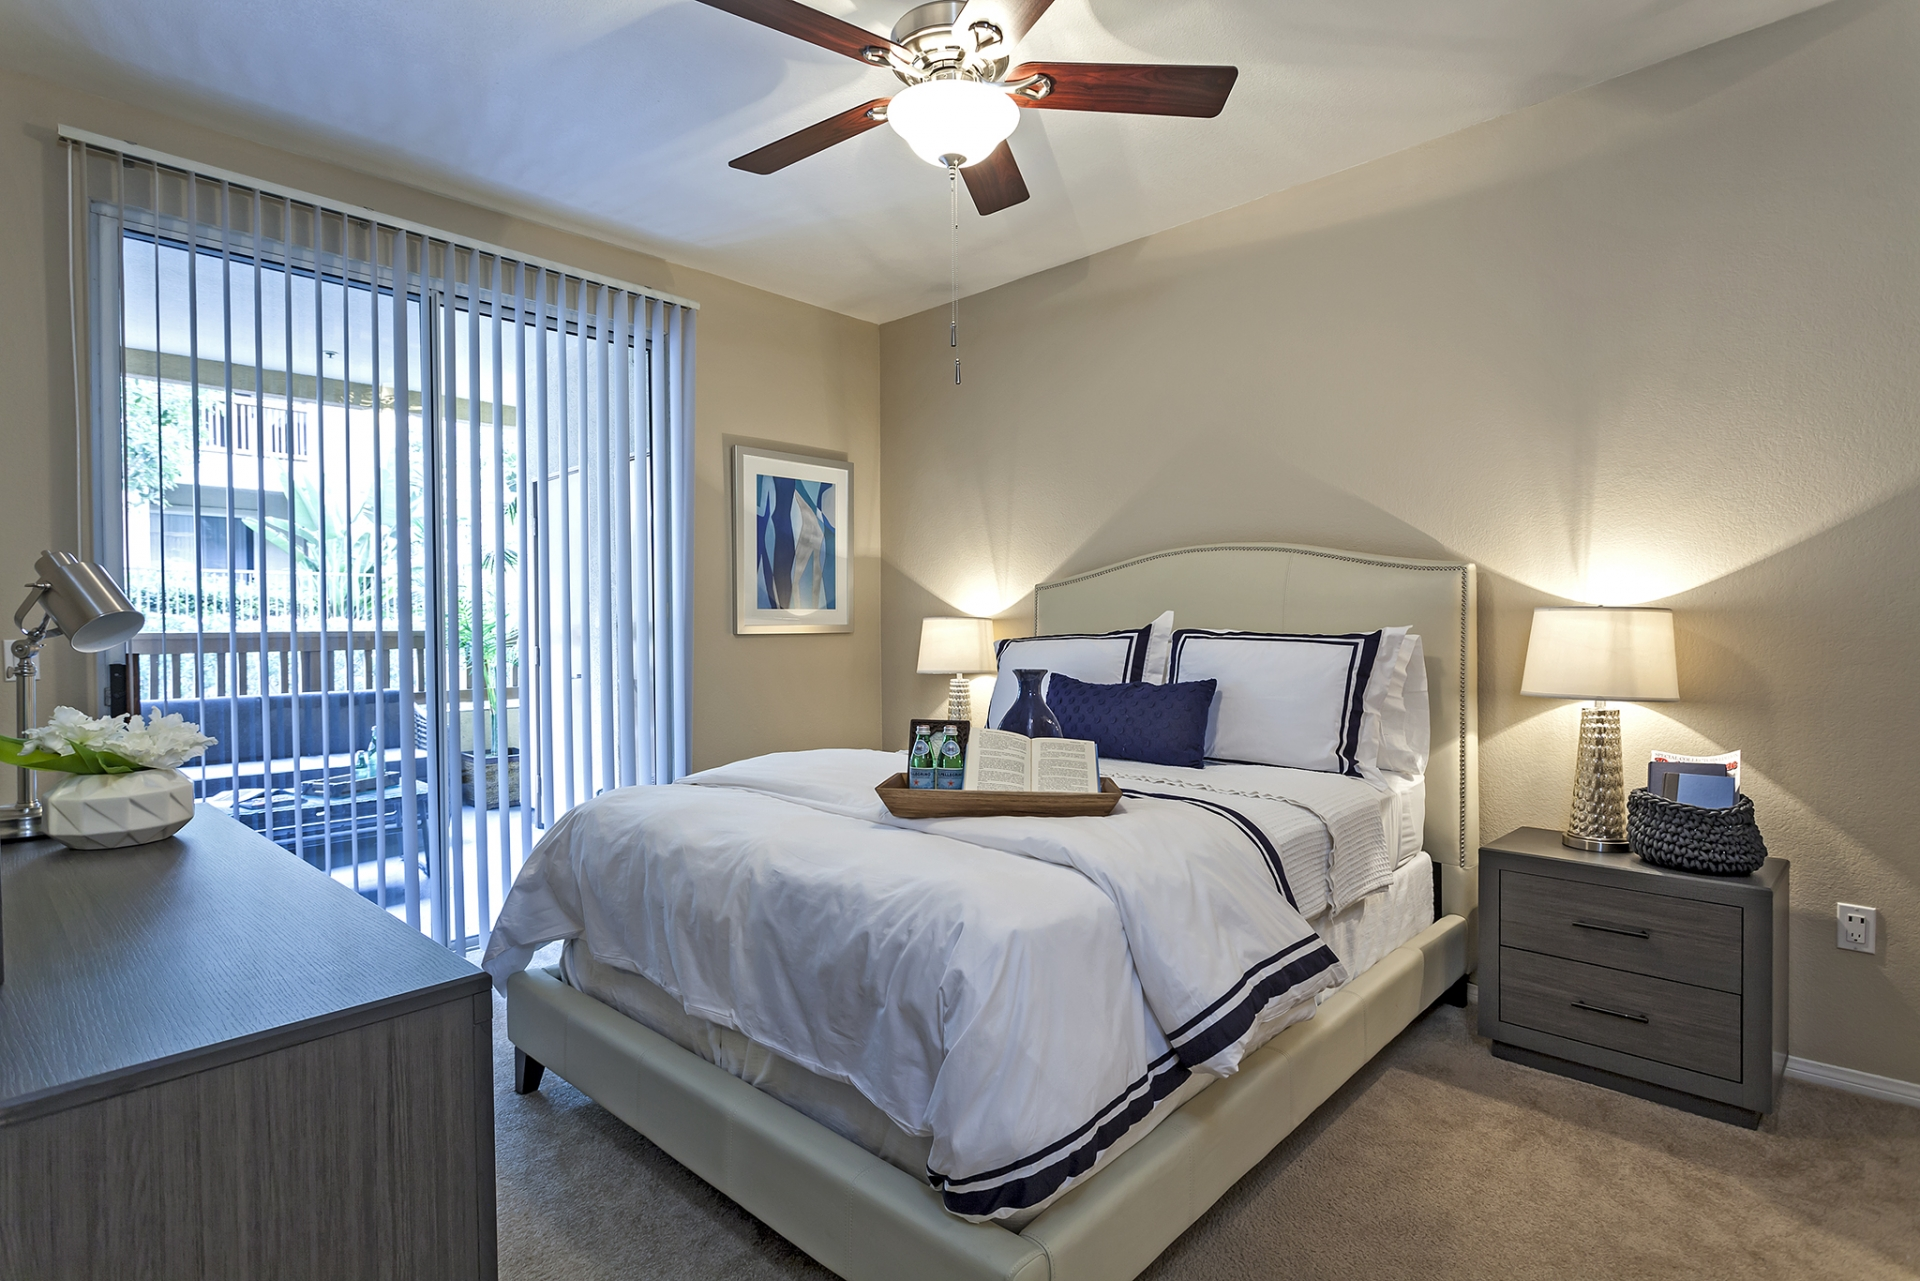 Camden Crown Valley Apartments image 5